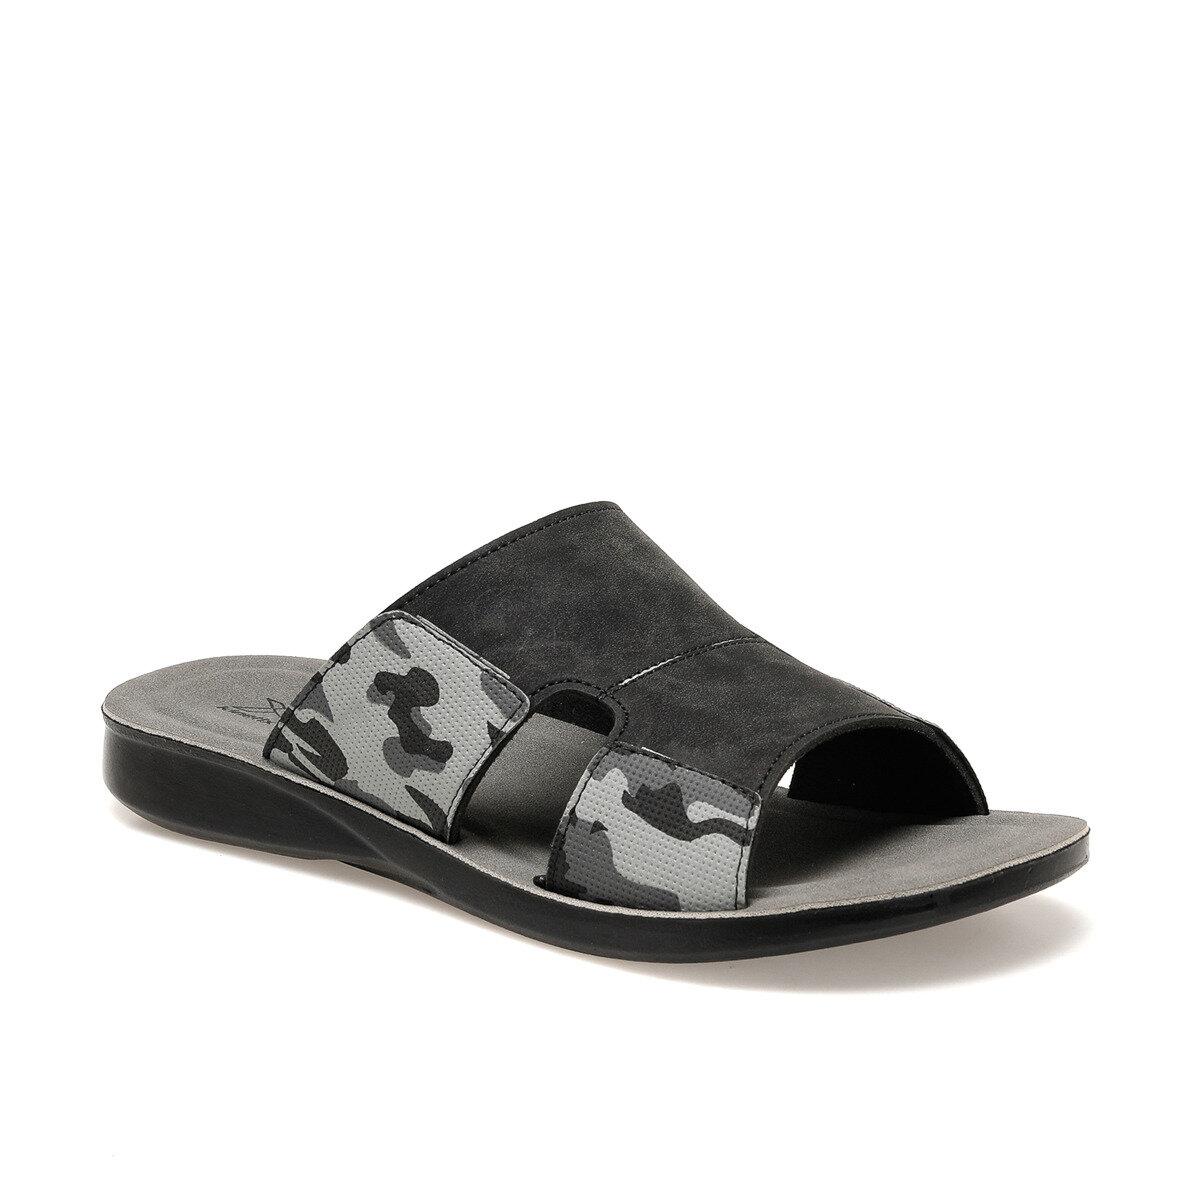 FLO Black Men Slippers Male Sandal For Men Feet Foot Massager Shoes  Casual Summer Male Chaussures KINETIX RESTON